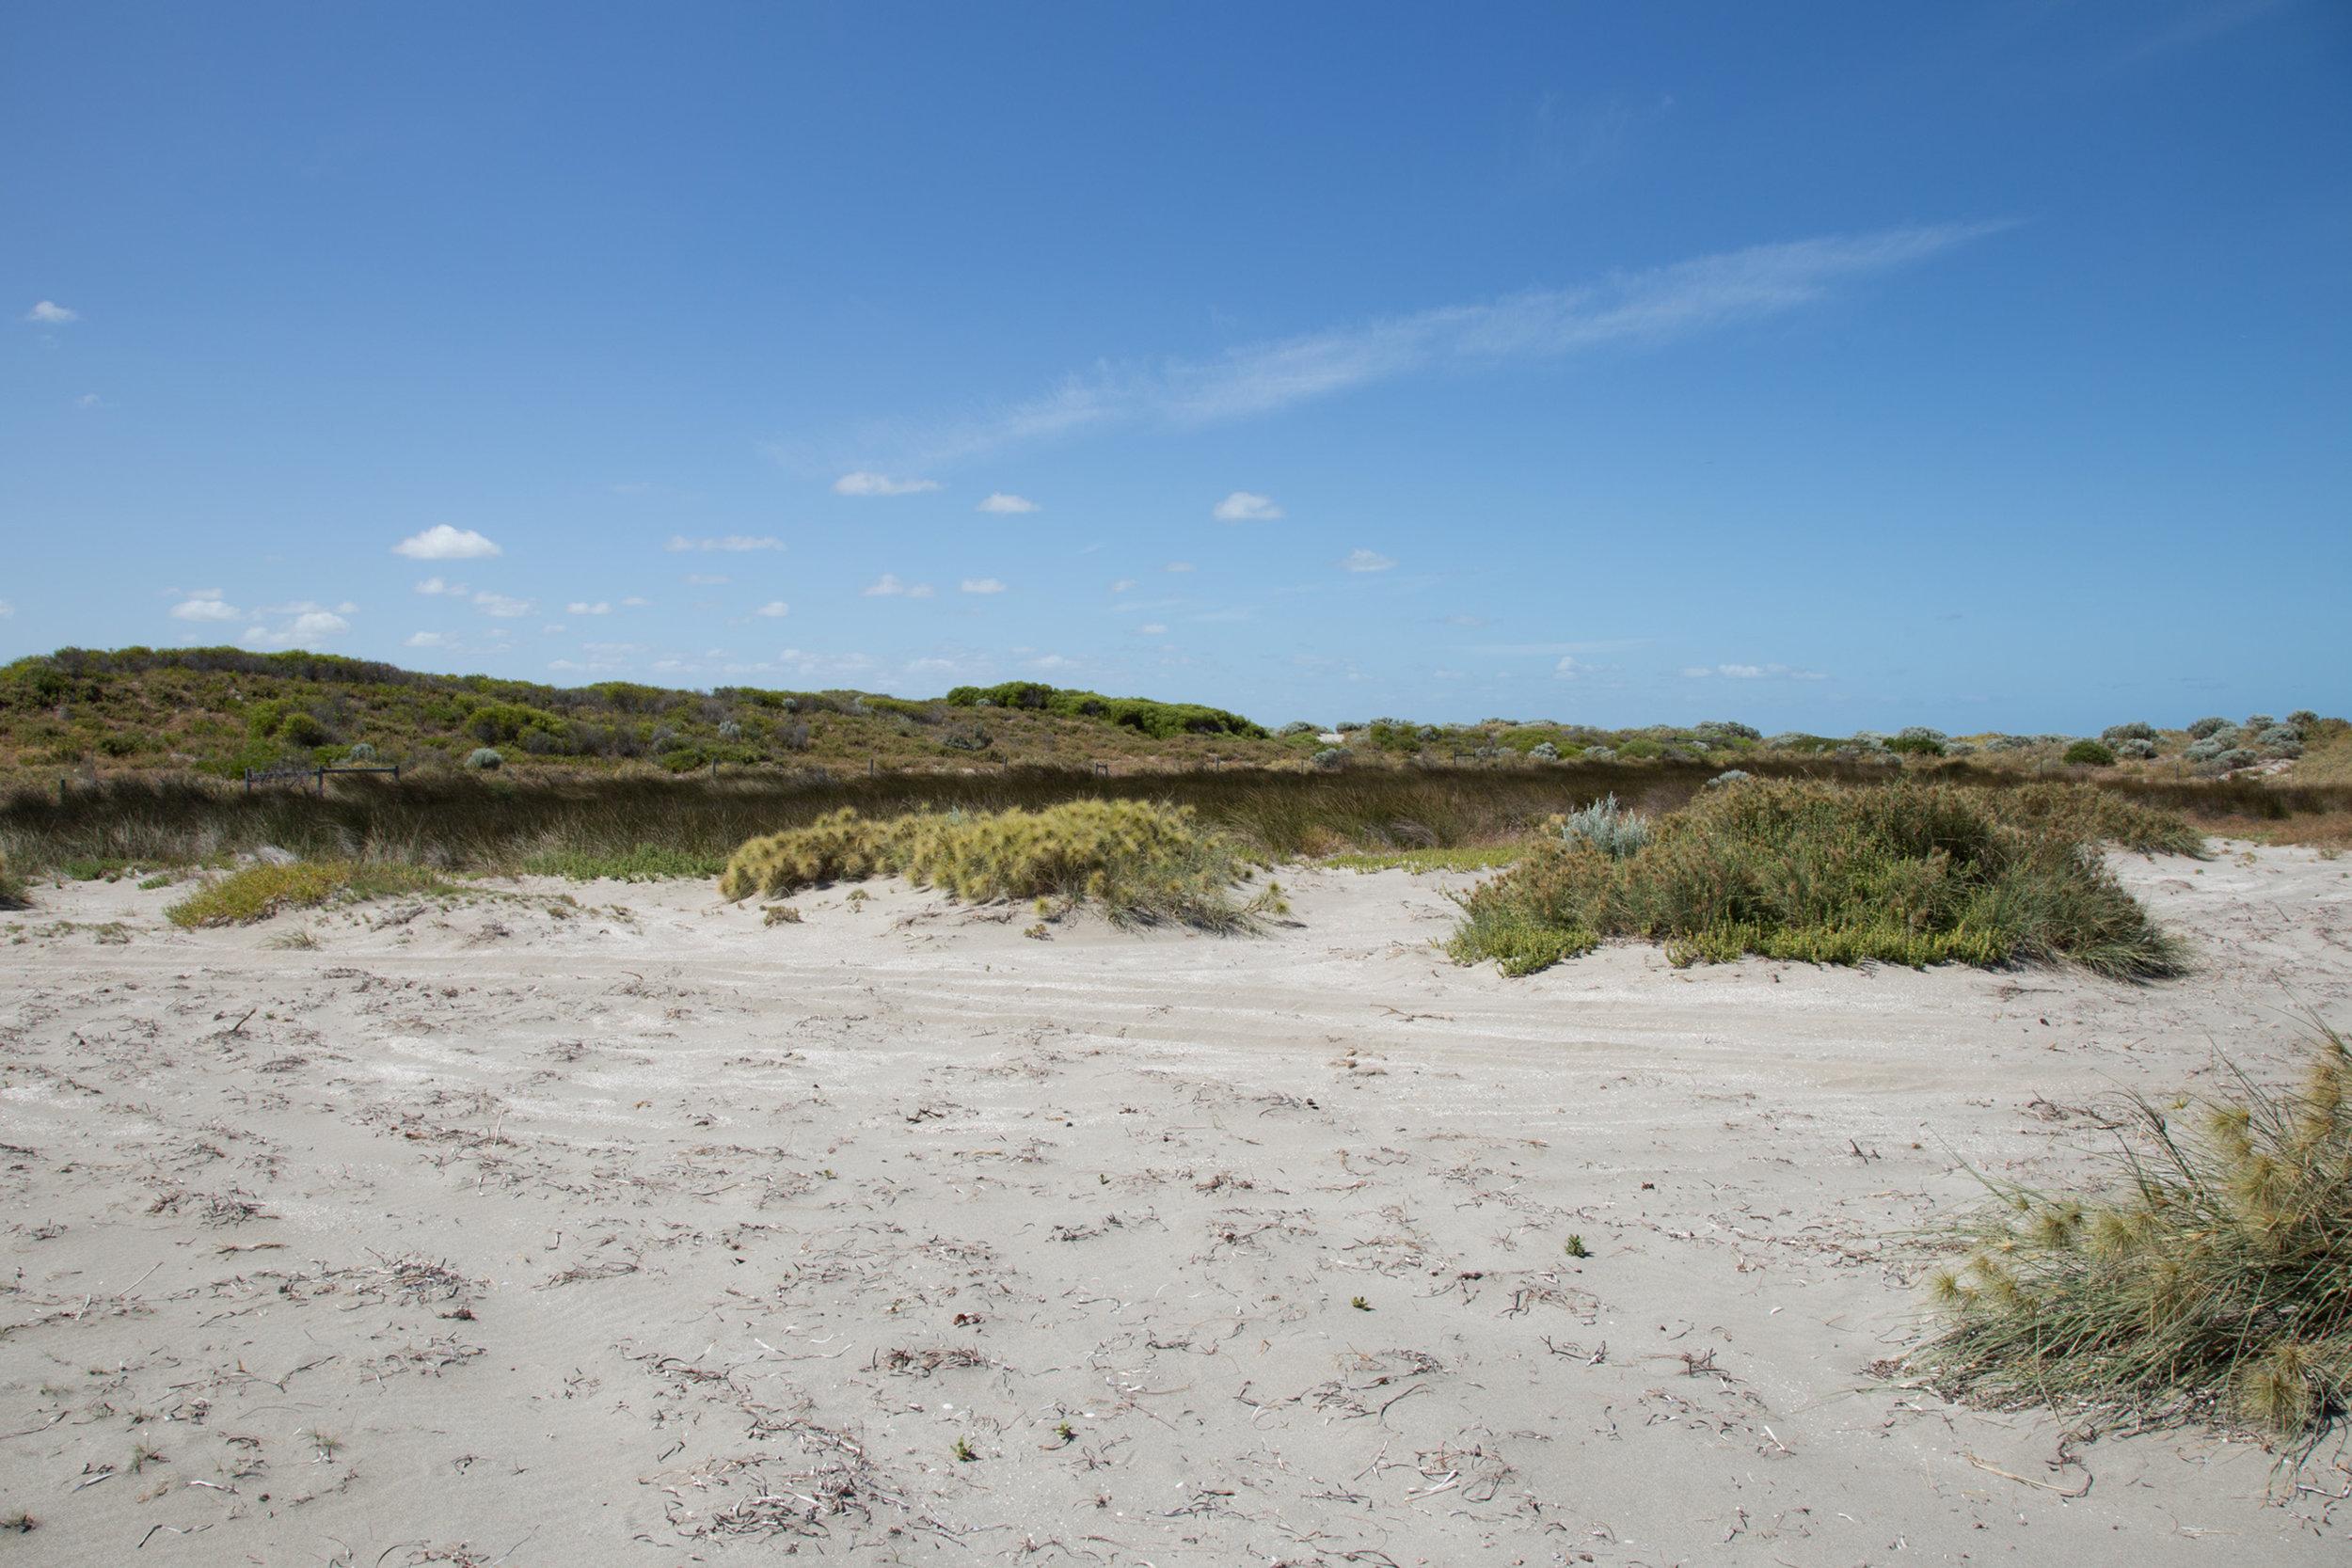 Plate 10: Fresh water wetland at Becher Point.